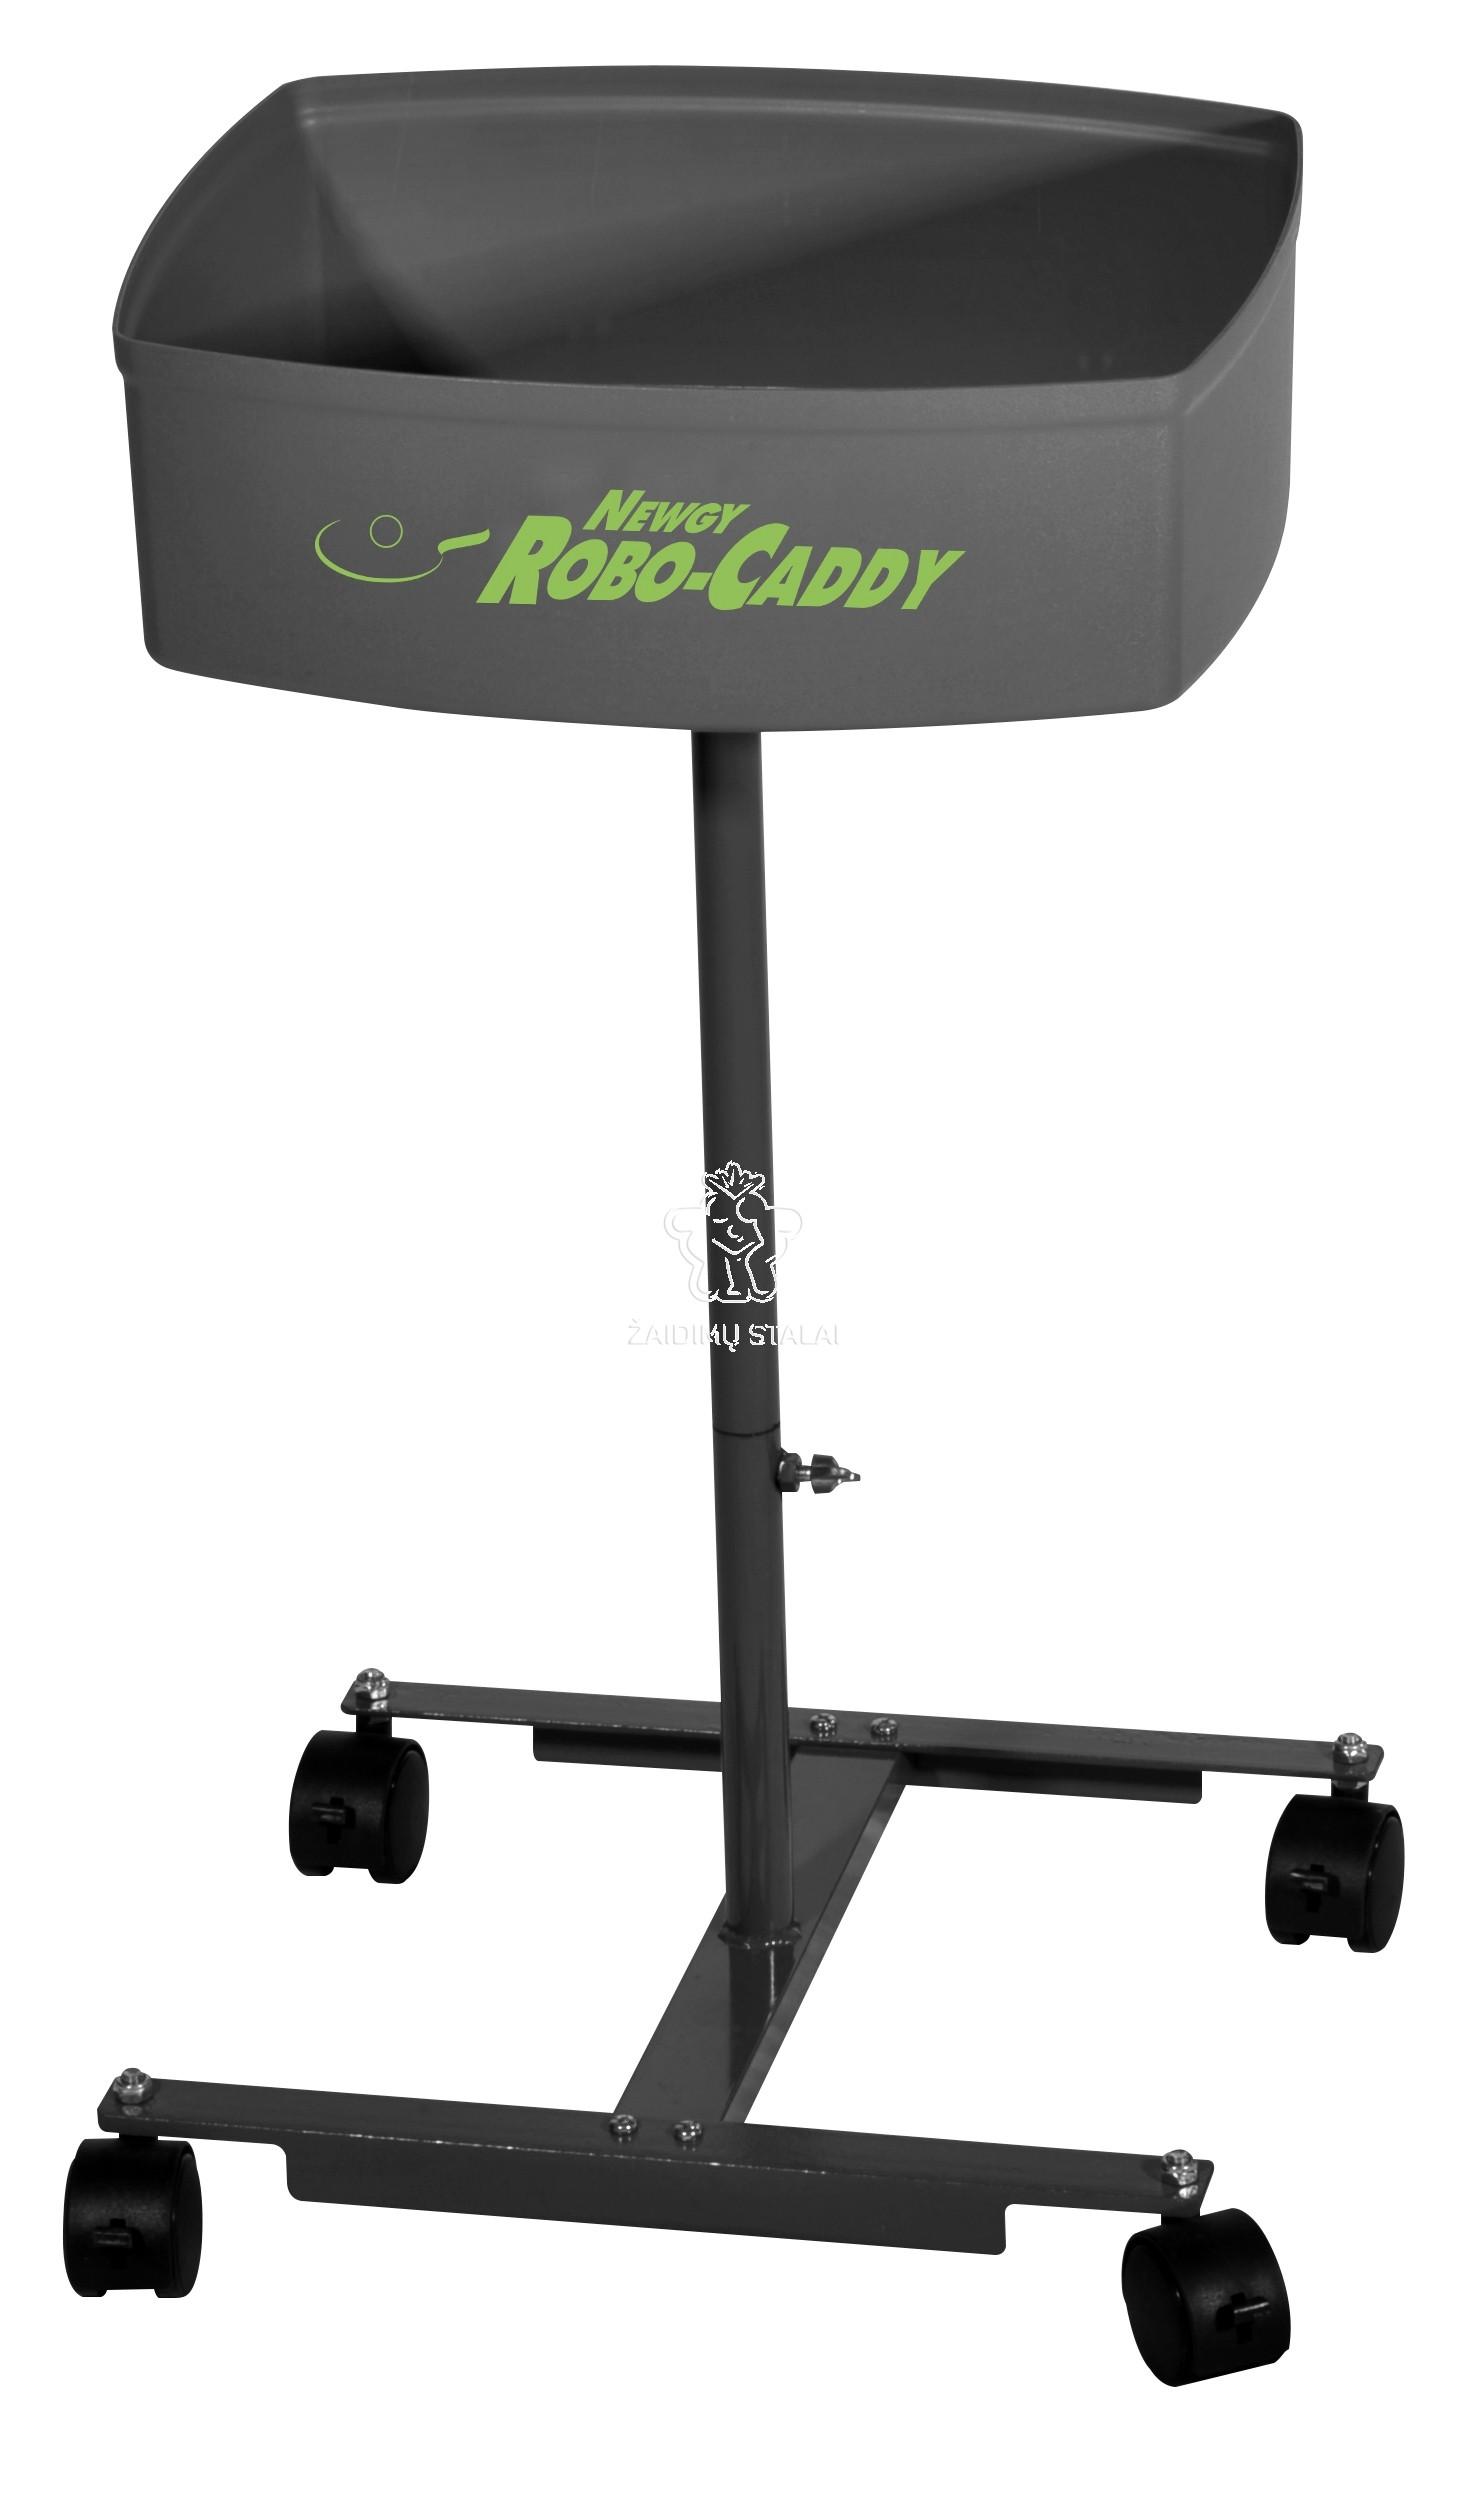 Stalo teniso roboto vežimėlis Donic ROBO-Caddy